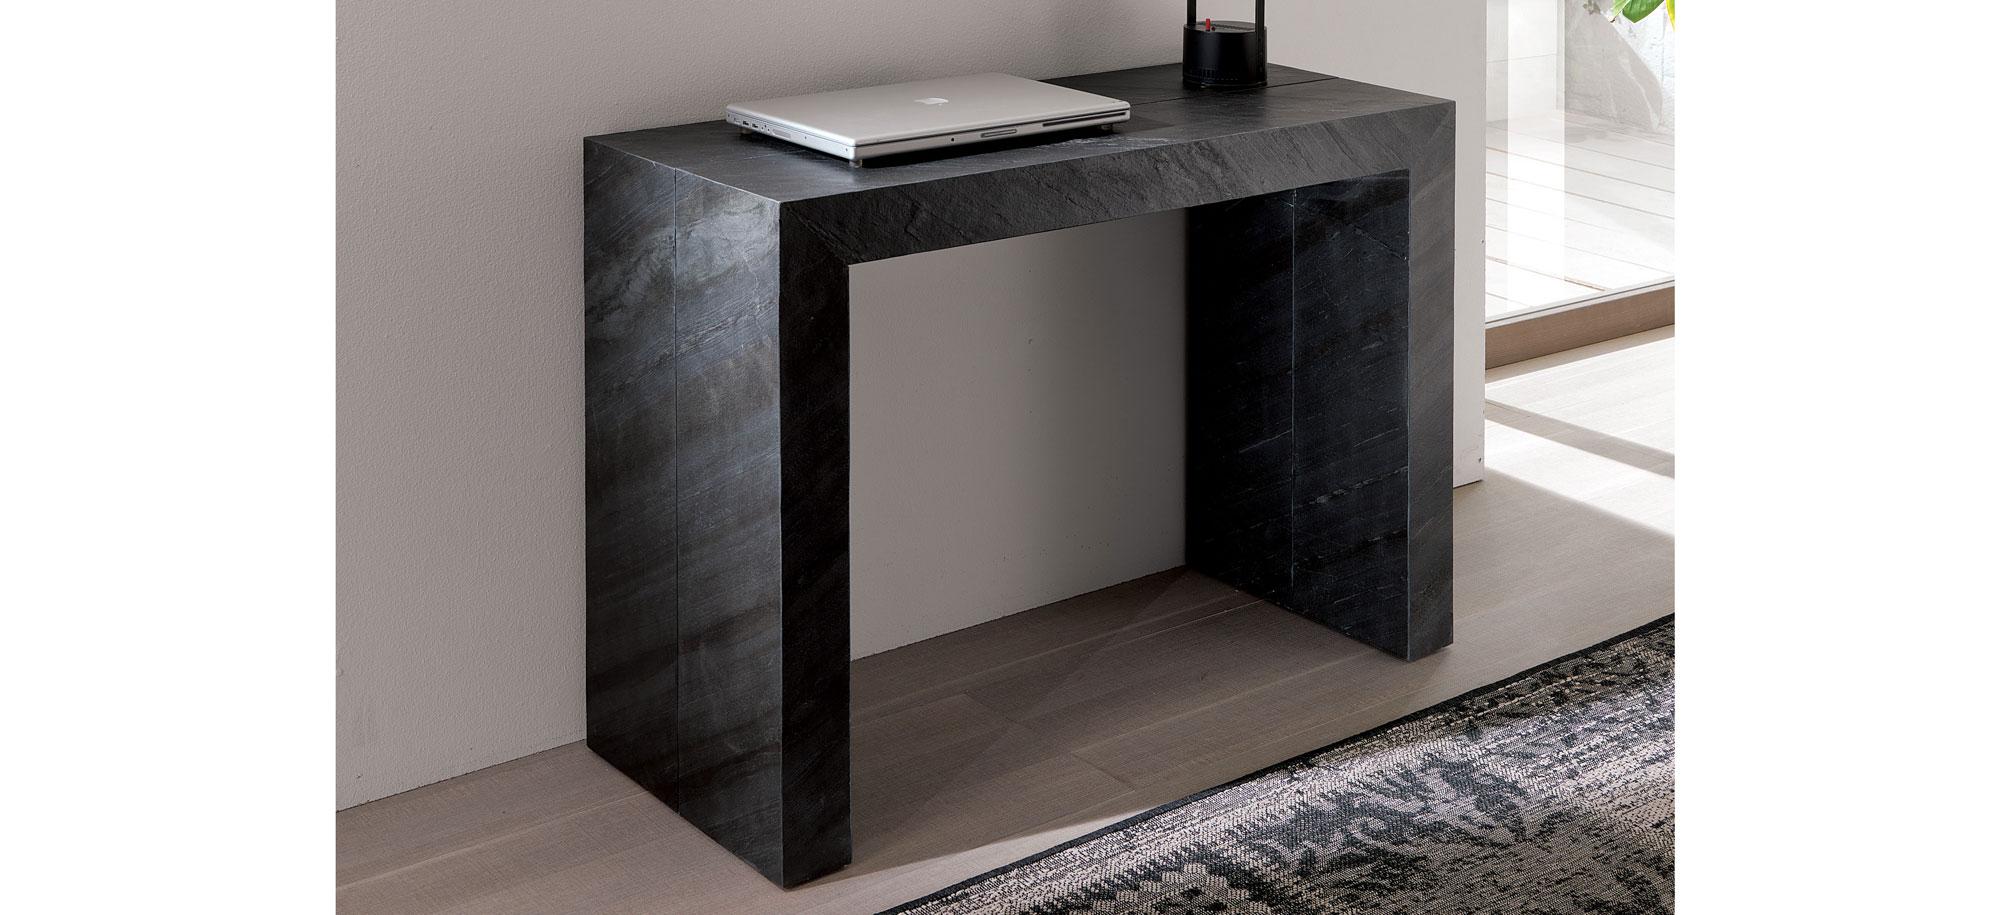 Consola mesa de comedor Moderna Stone en Portobellostreet.es